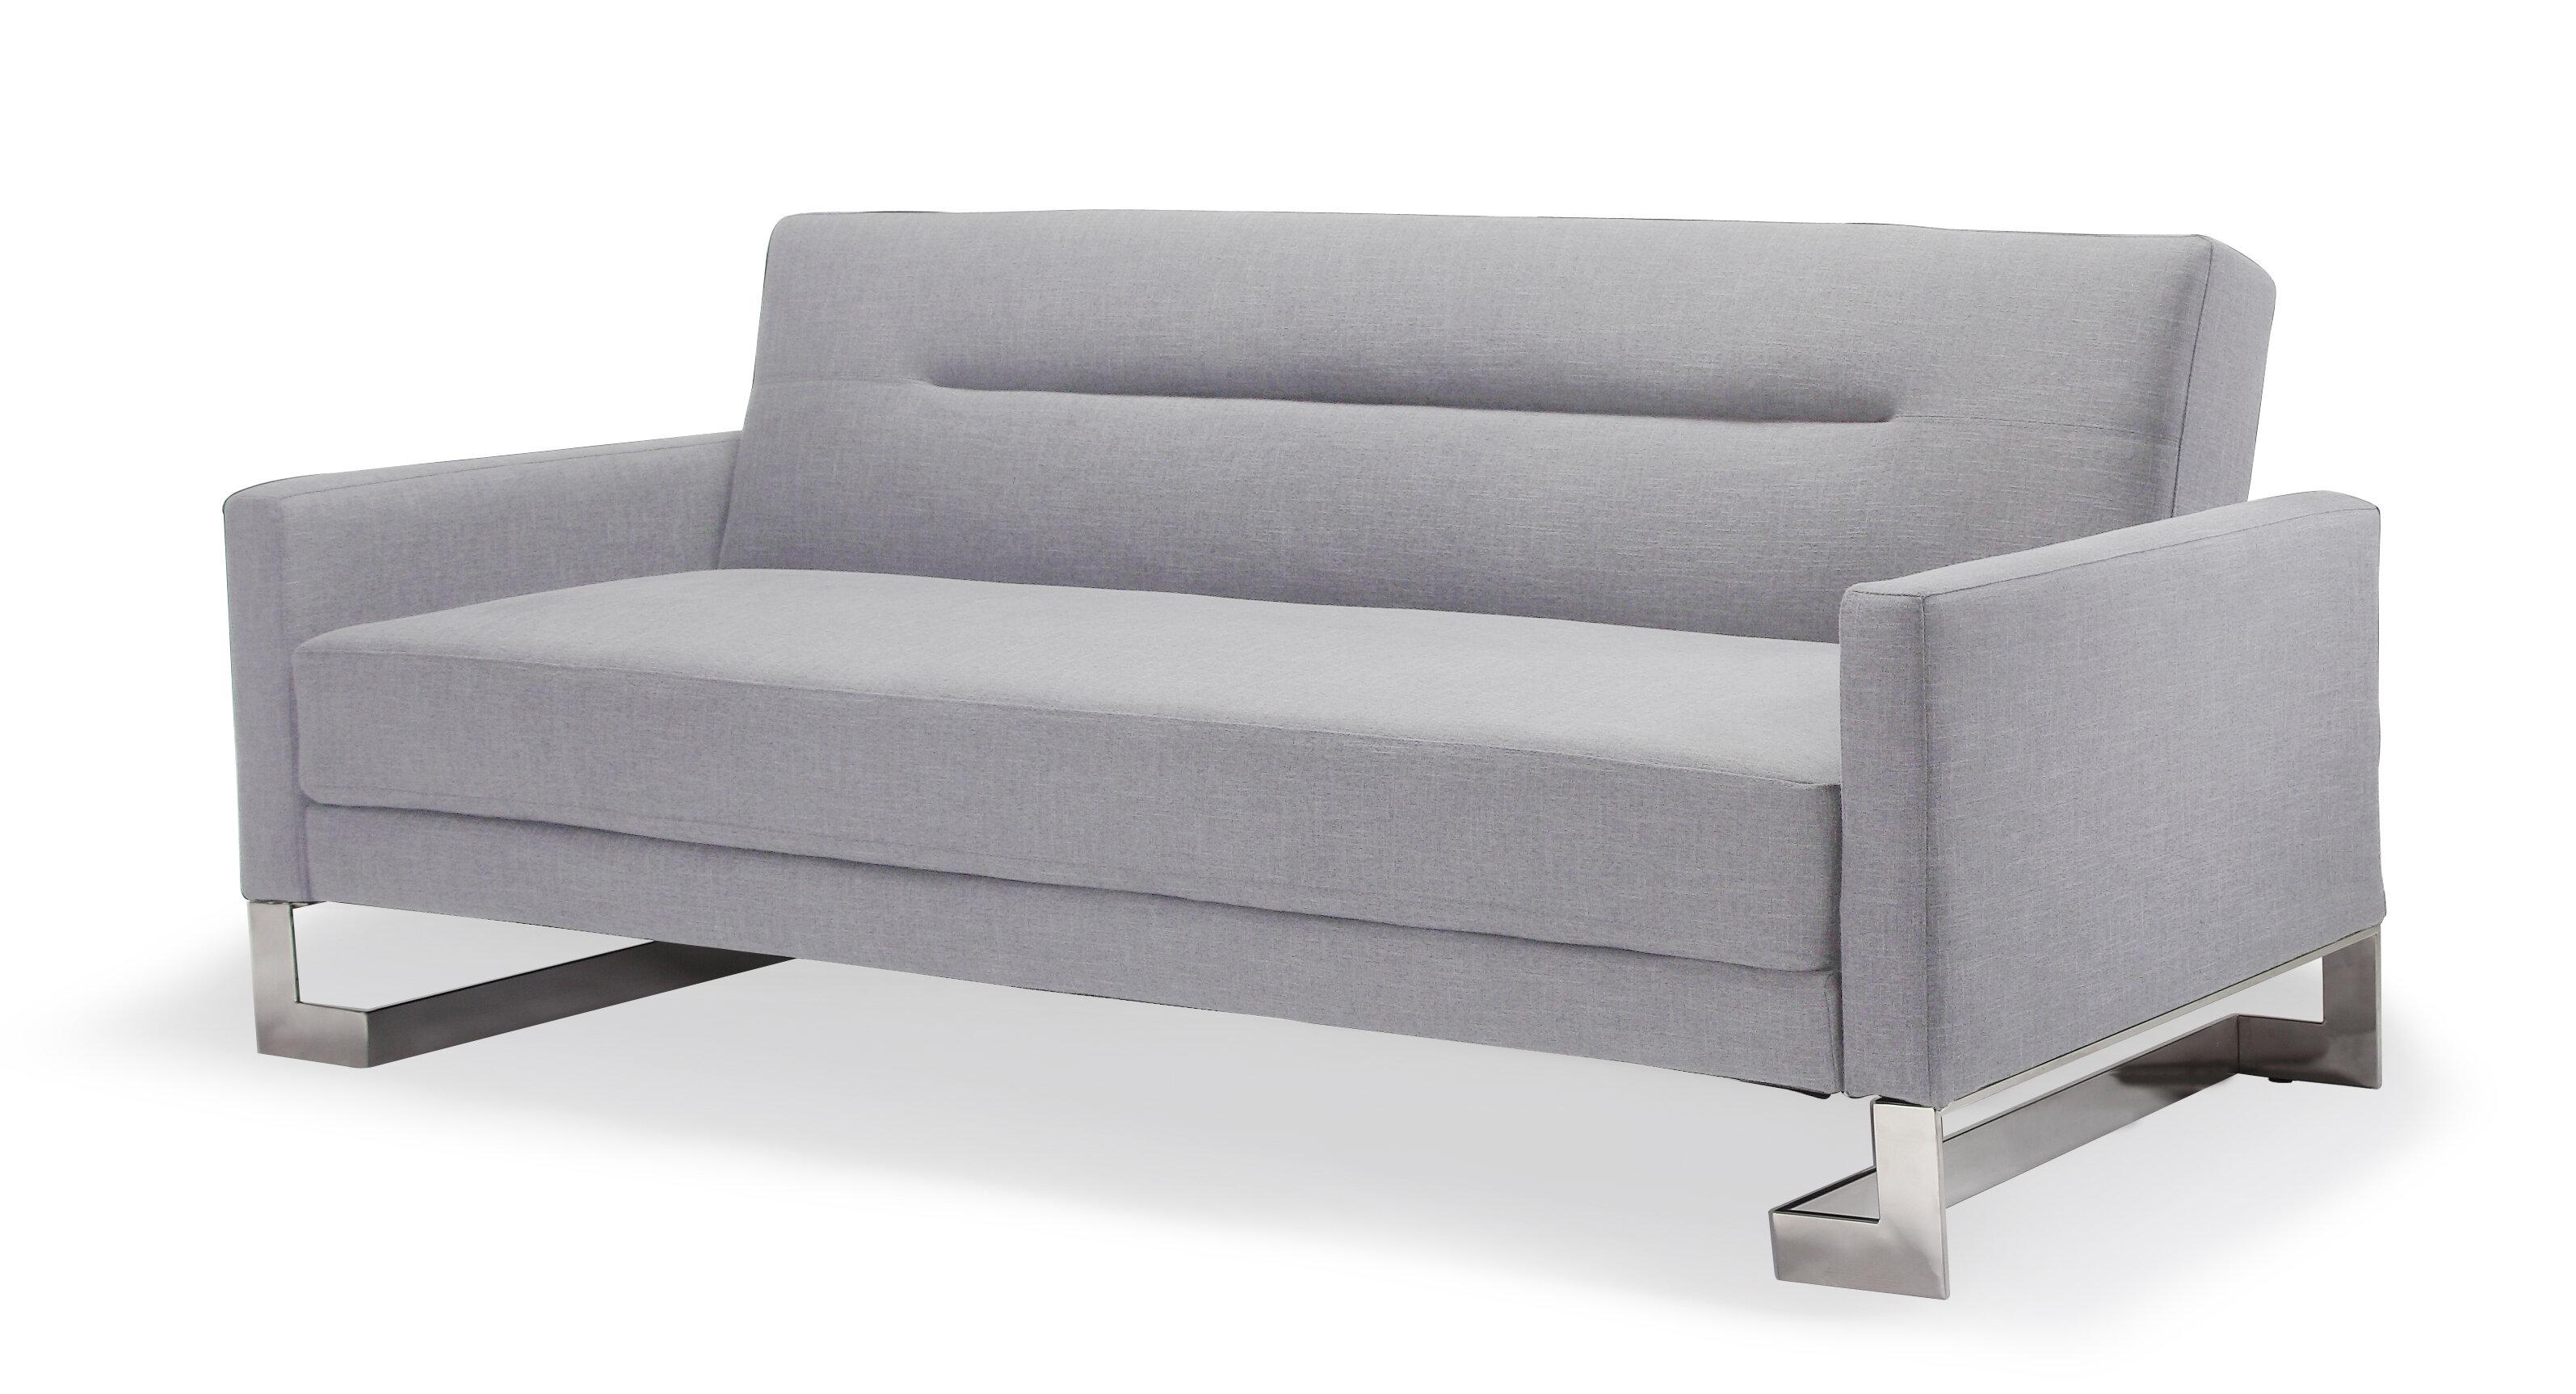 Godmond Modern Sleeper Sofa